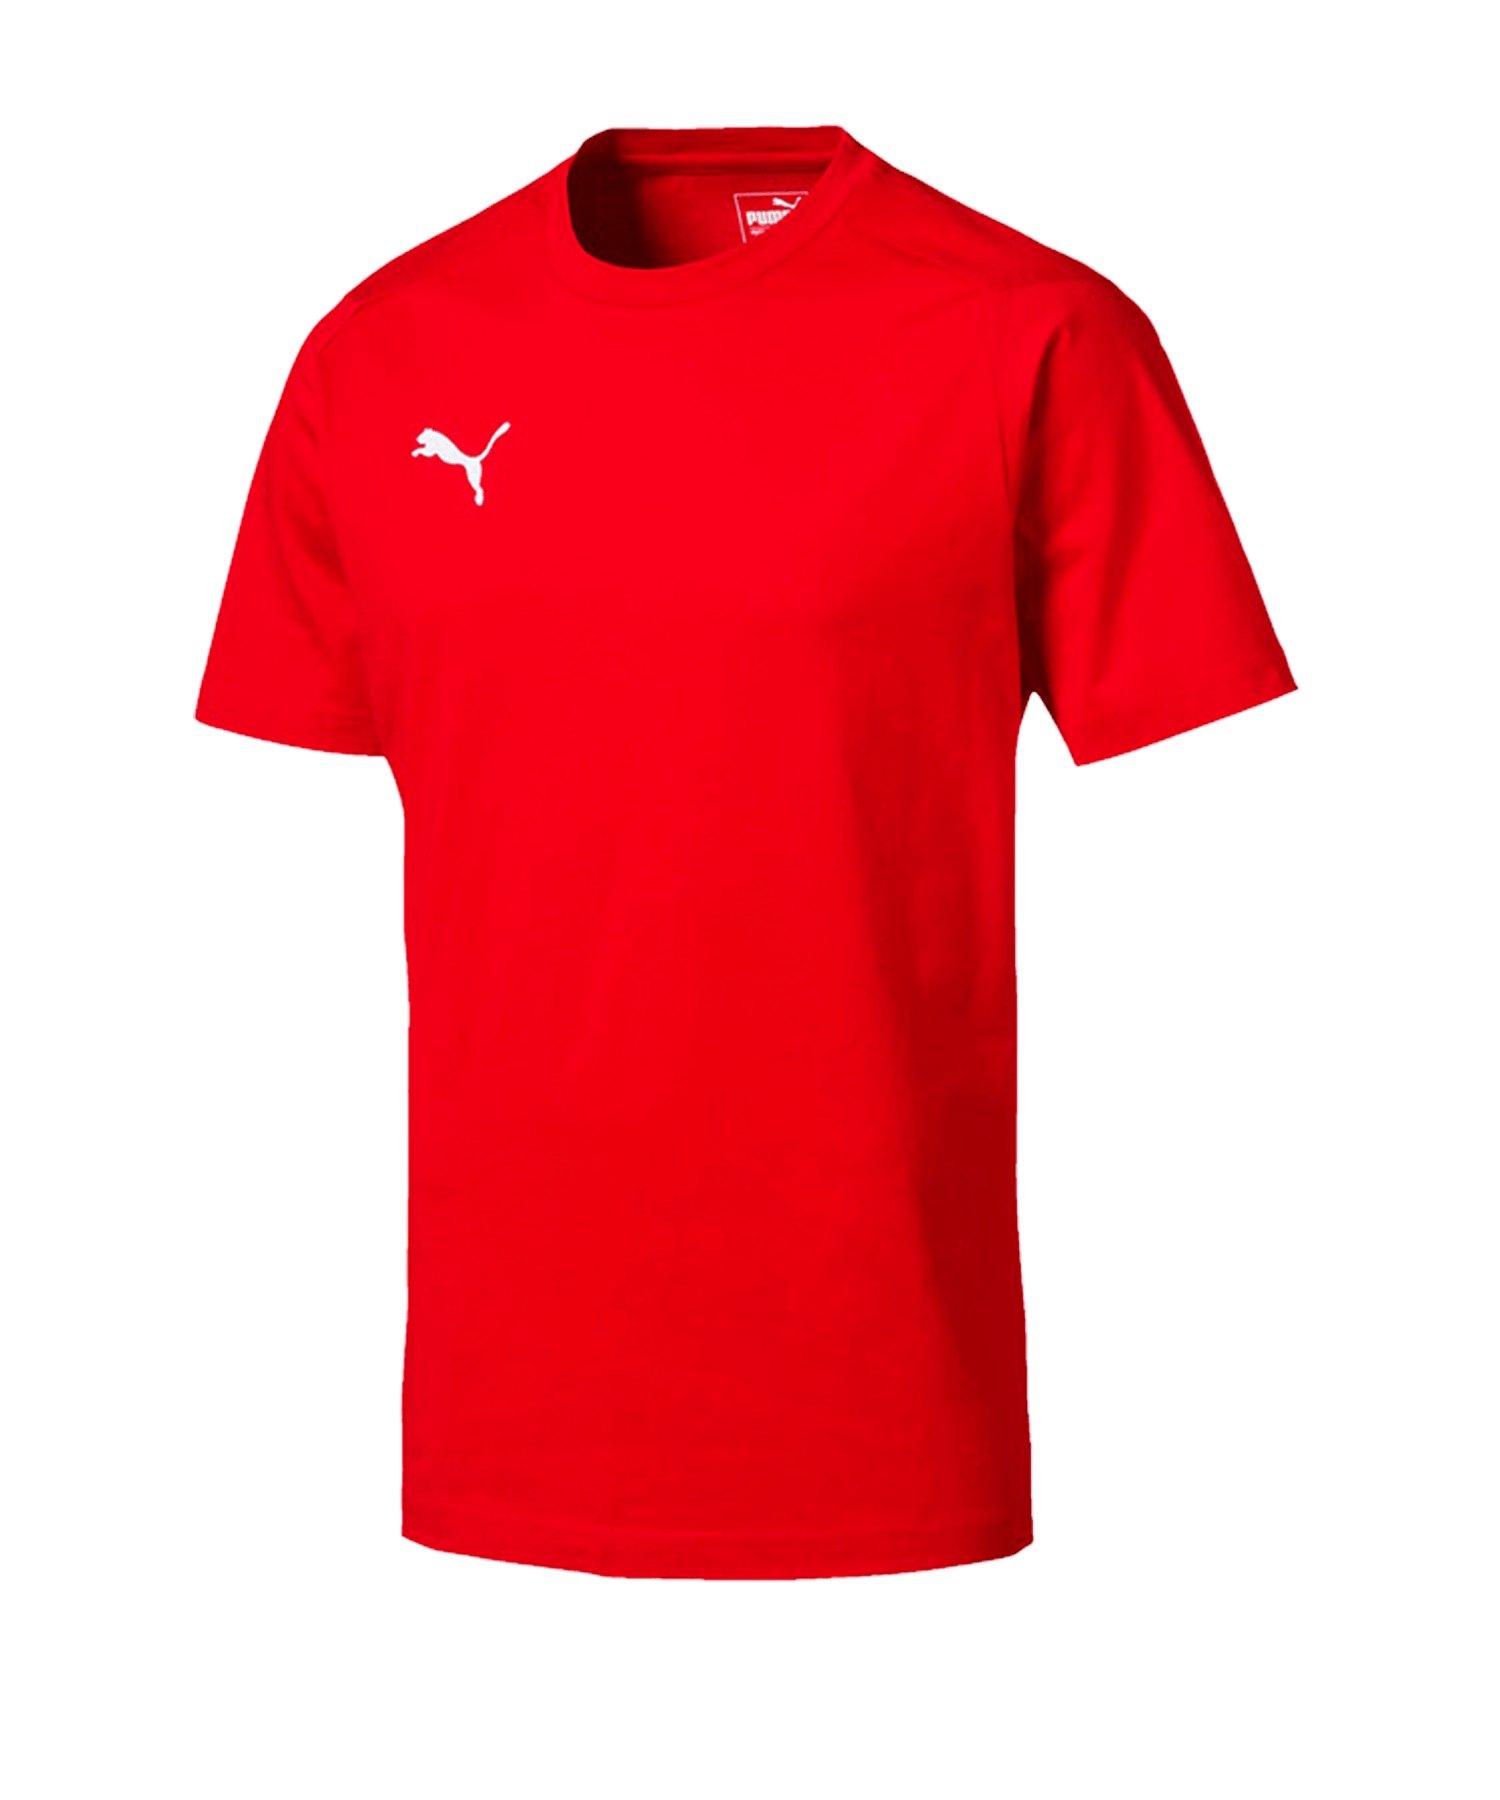 PUMA LIGA Casuals Tee T-Shirt Rot F01 - rot